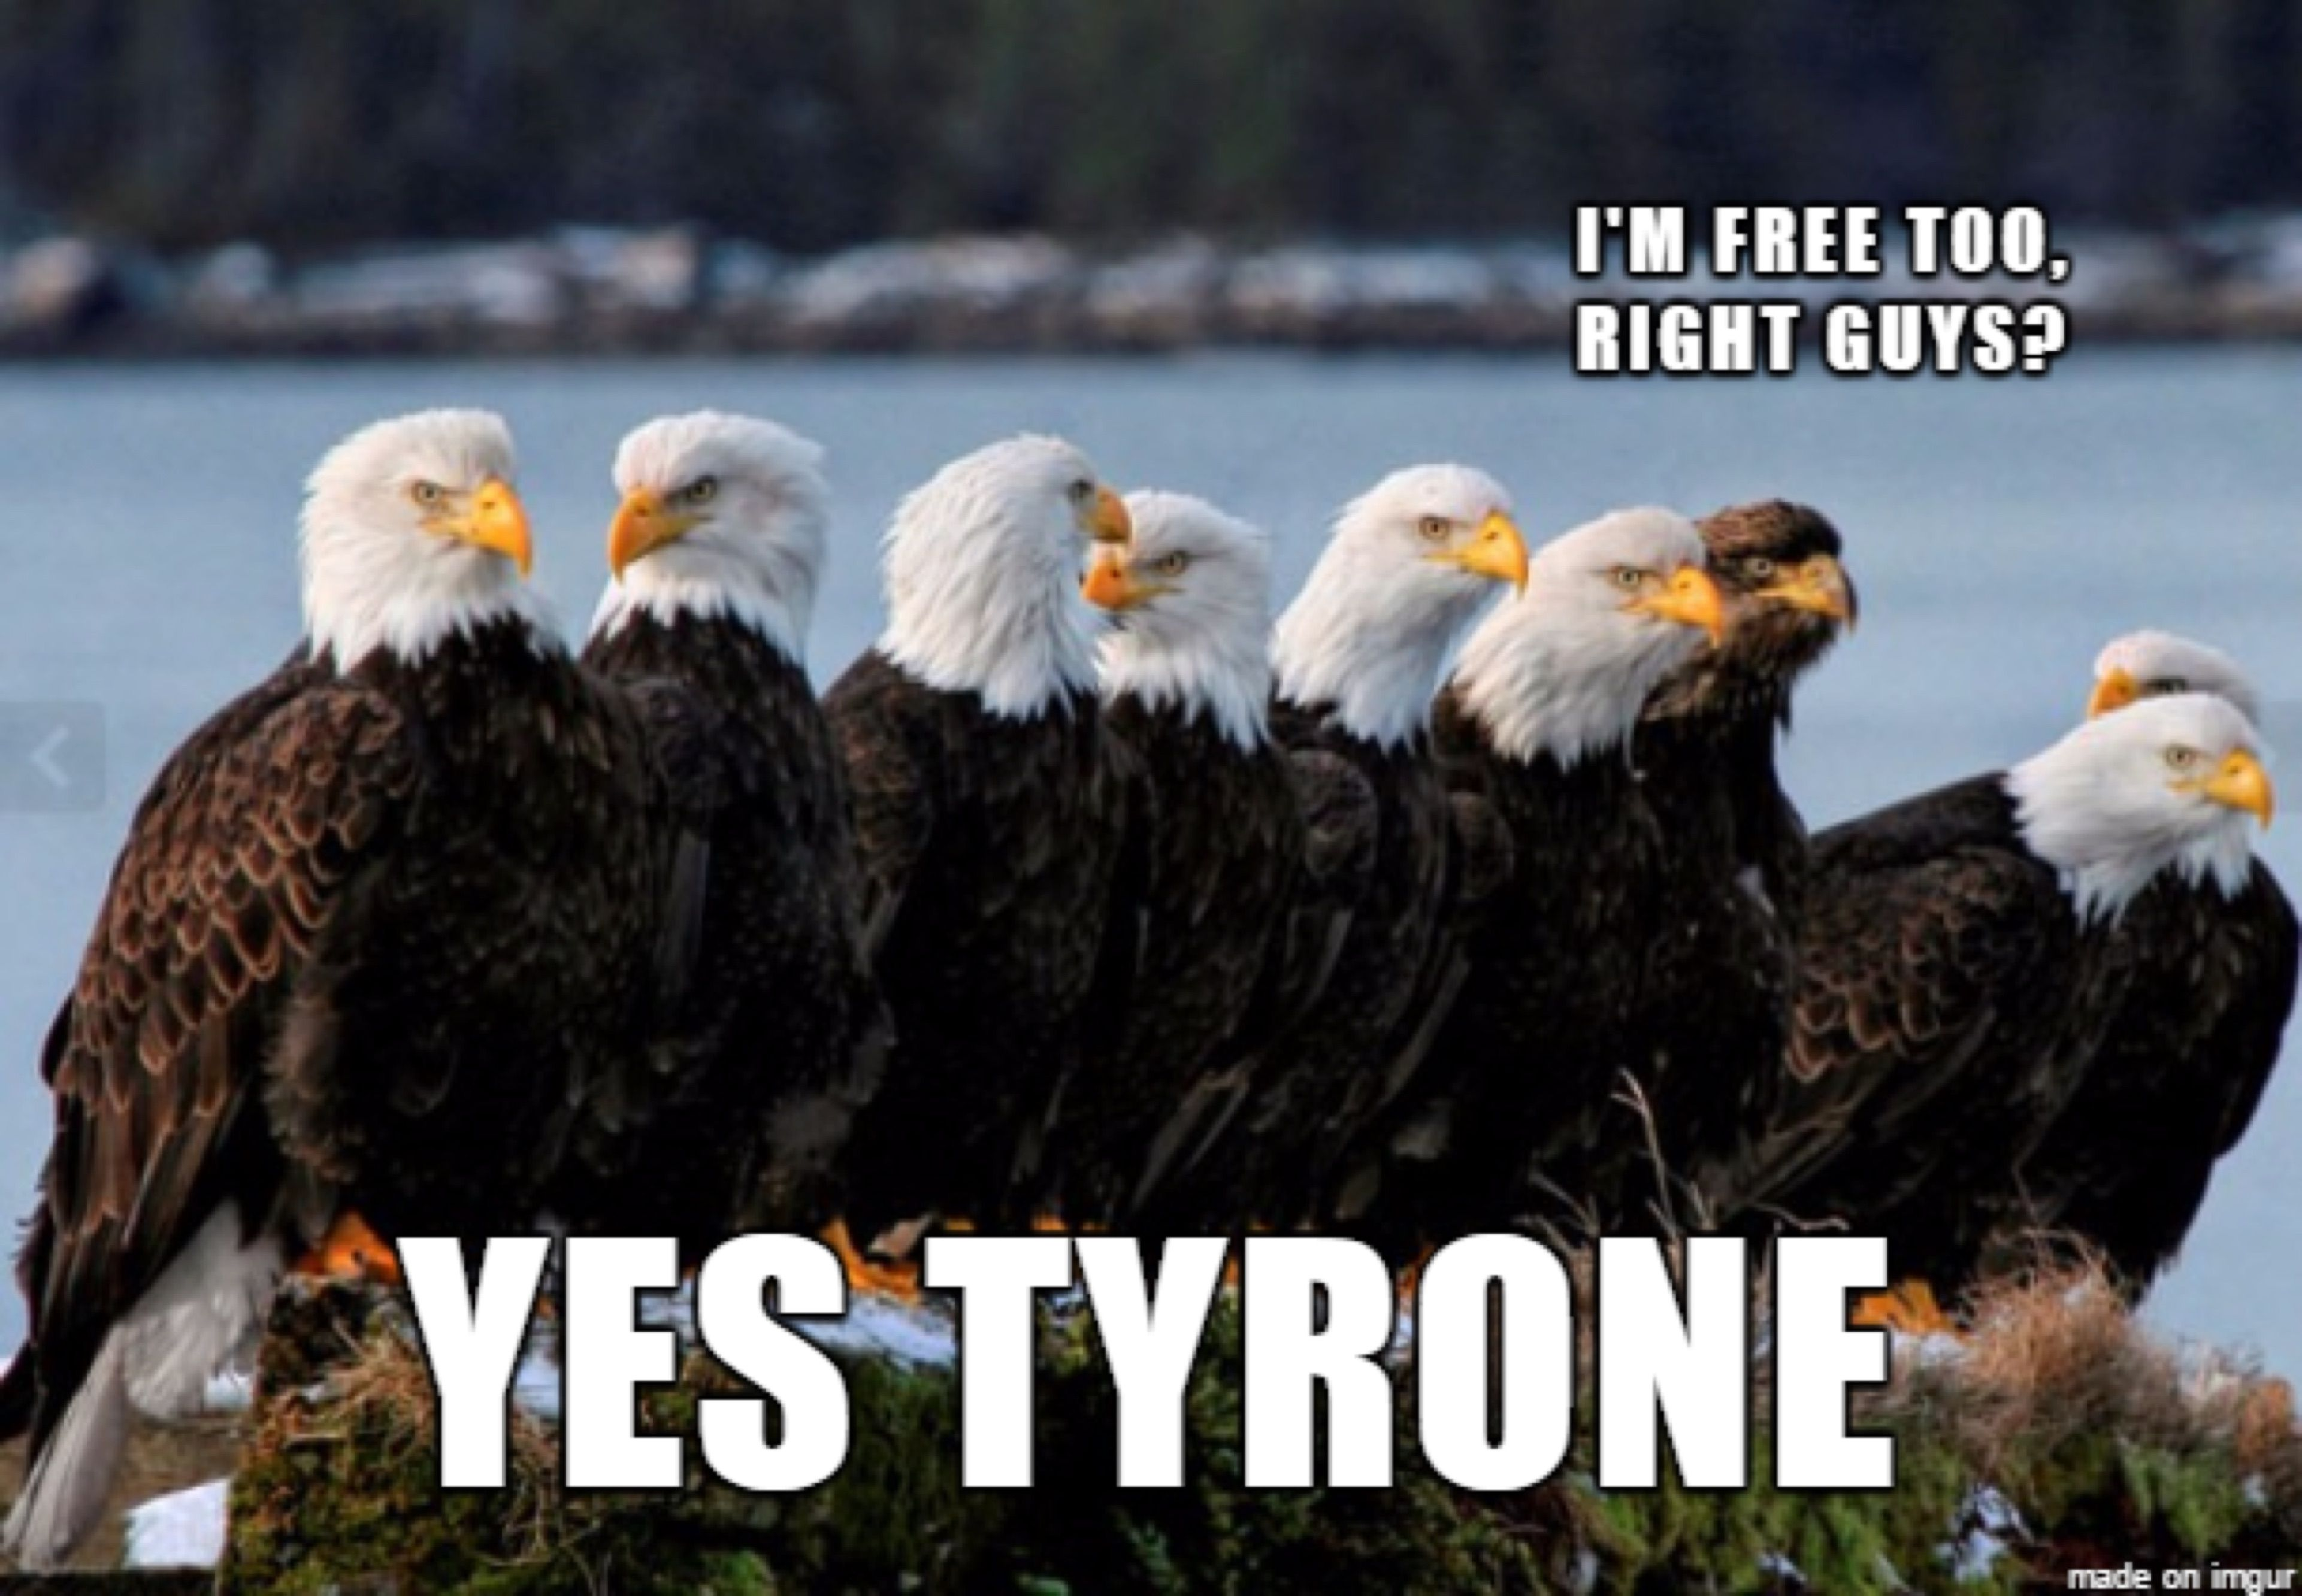 fdda09cafa76837419673db522b00a80 funniest bald eagle meme compilation america! humor pinterest